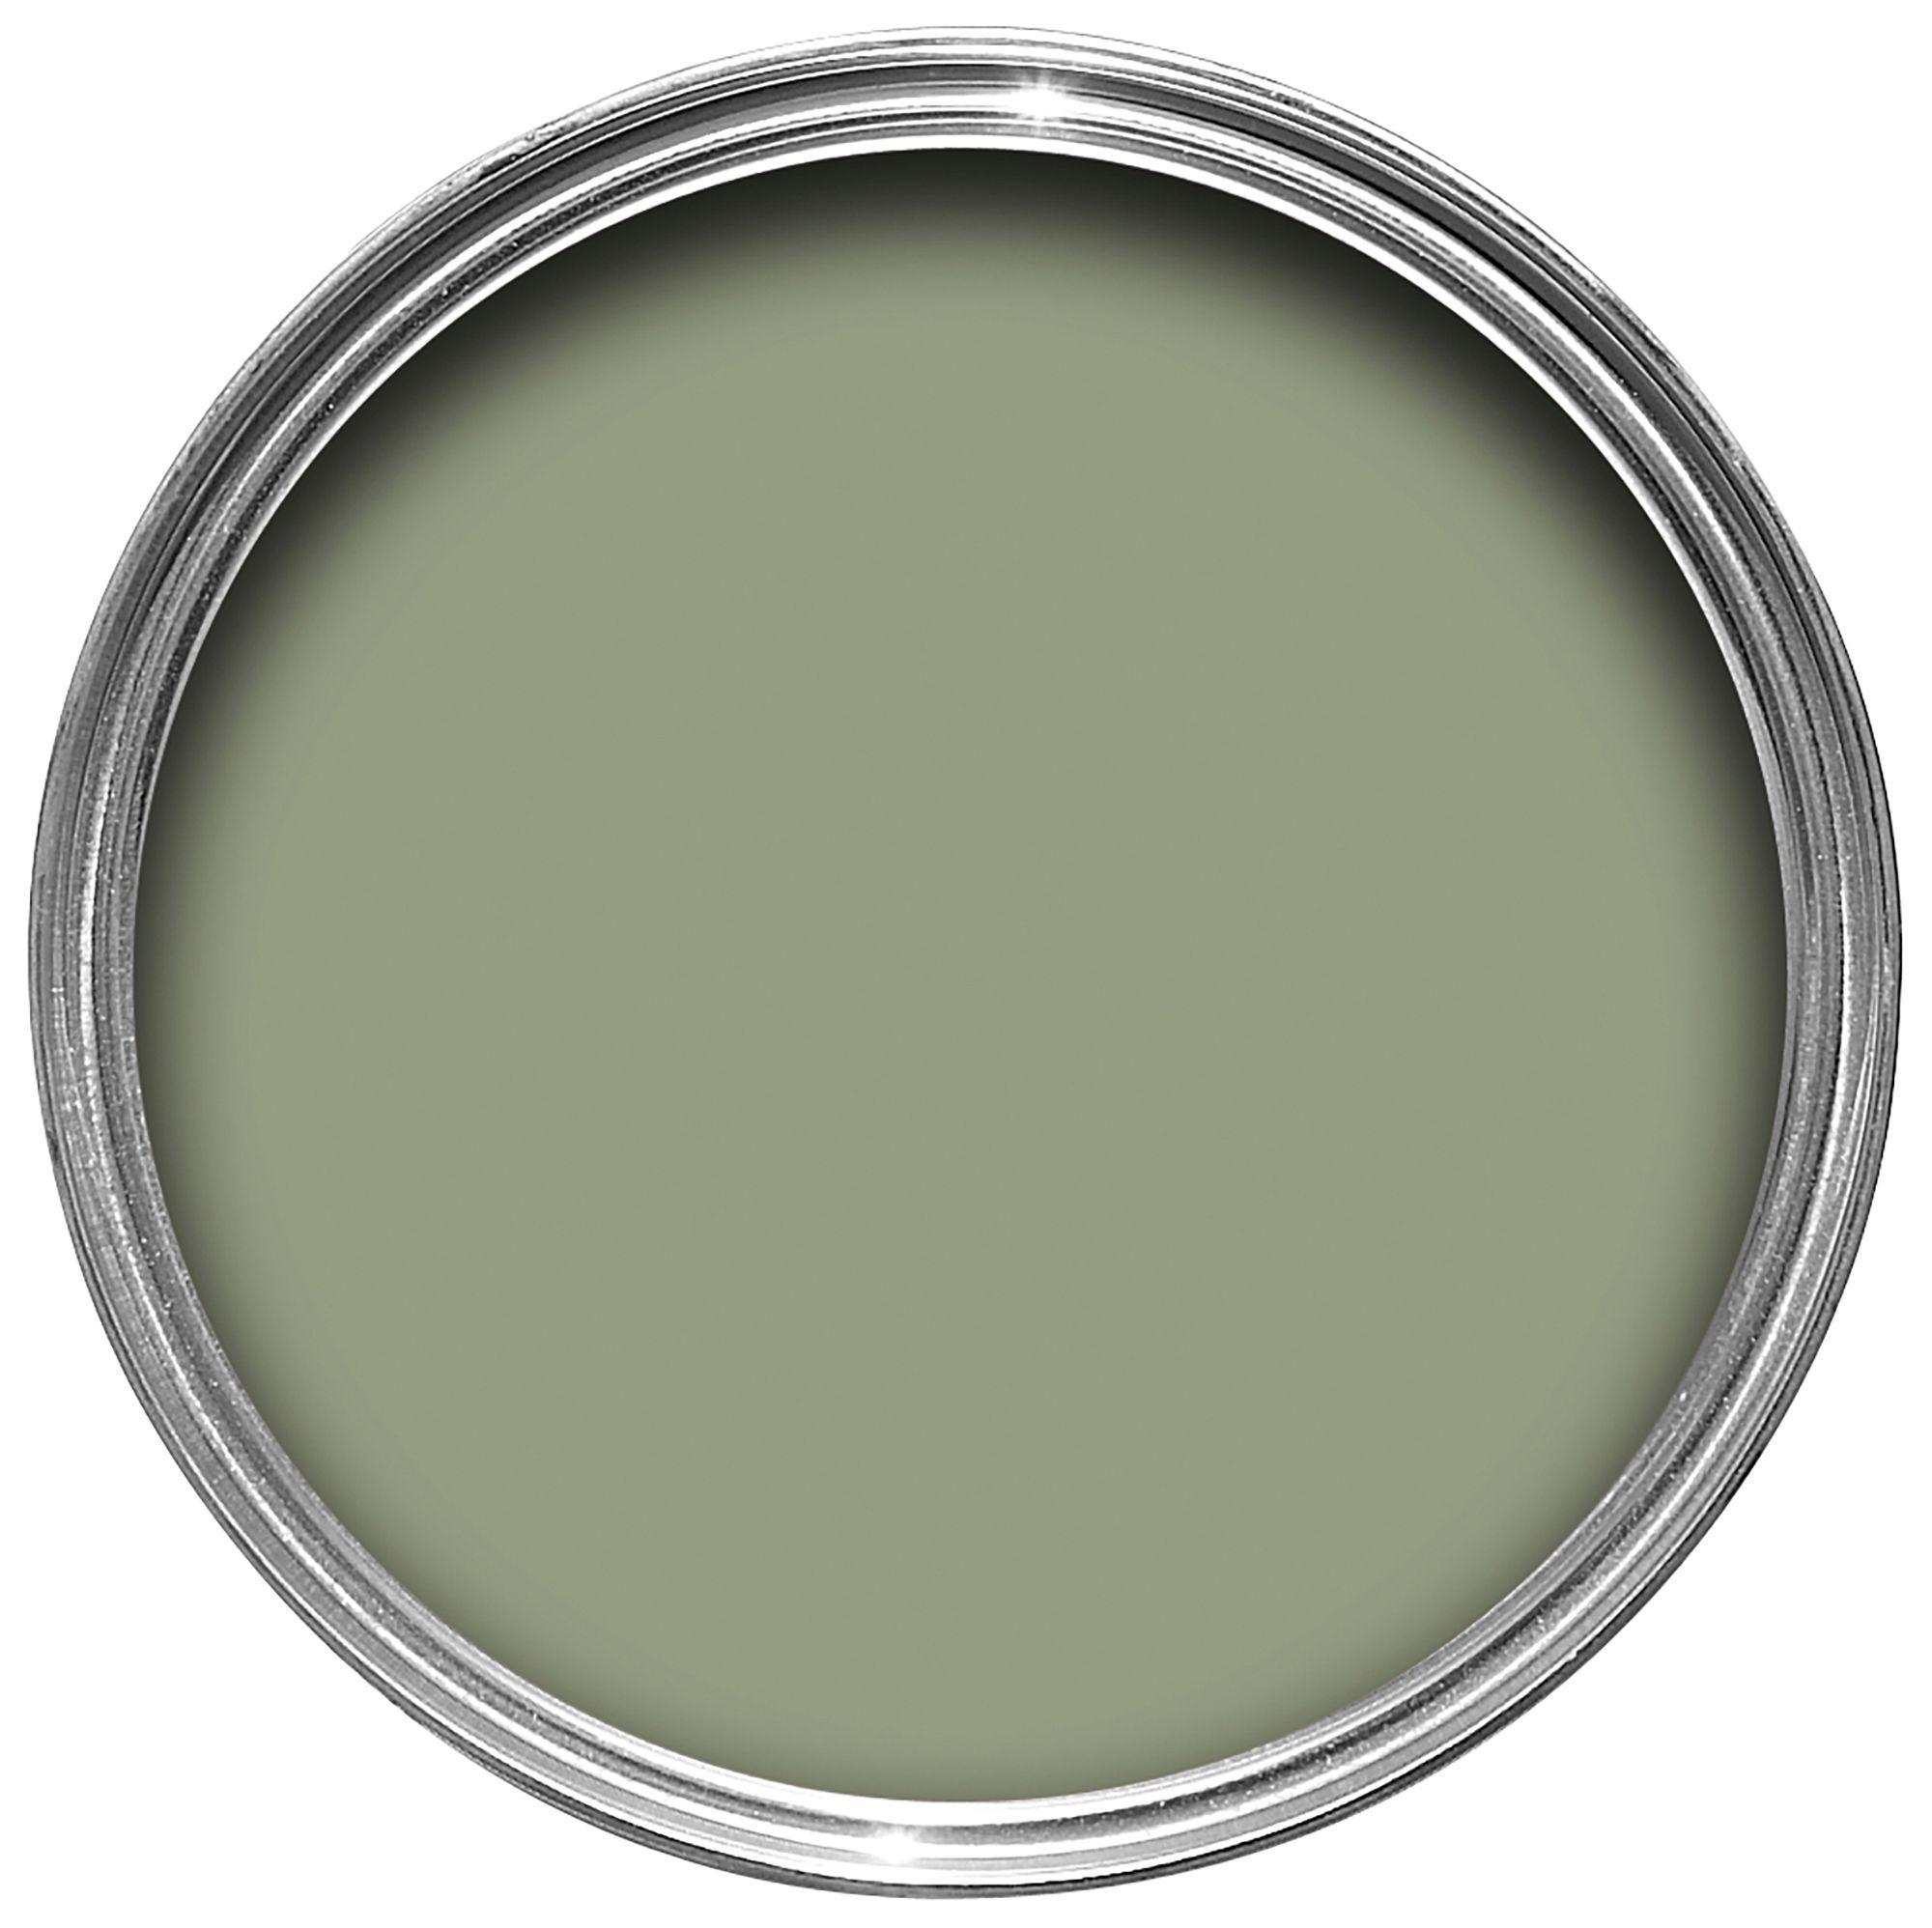 Dulux Weathershield External Glade Green Satin Paint 750ml Departments Diy At B Q